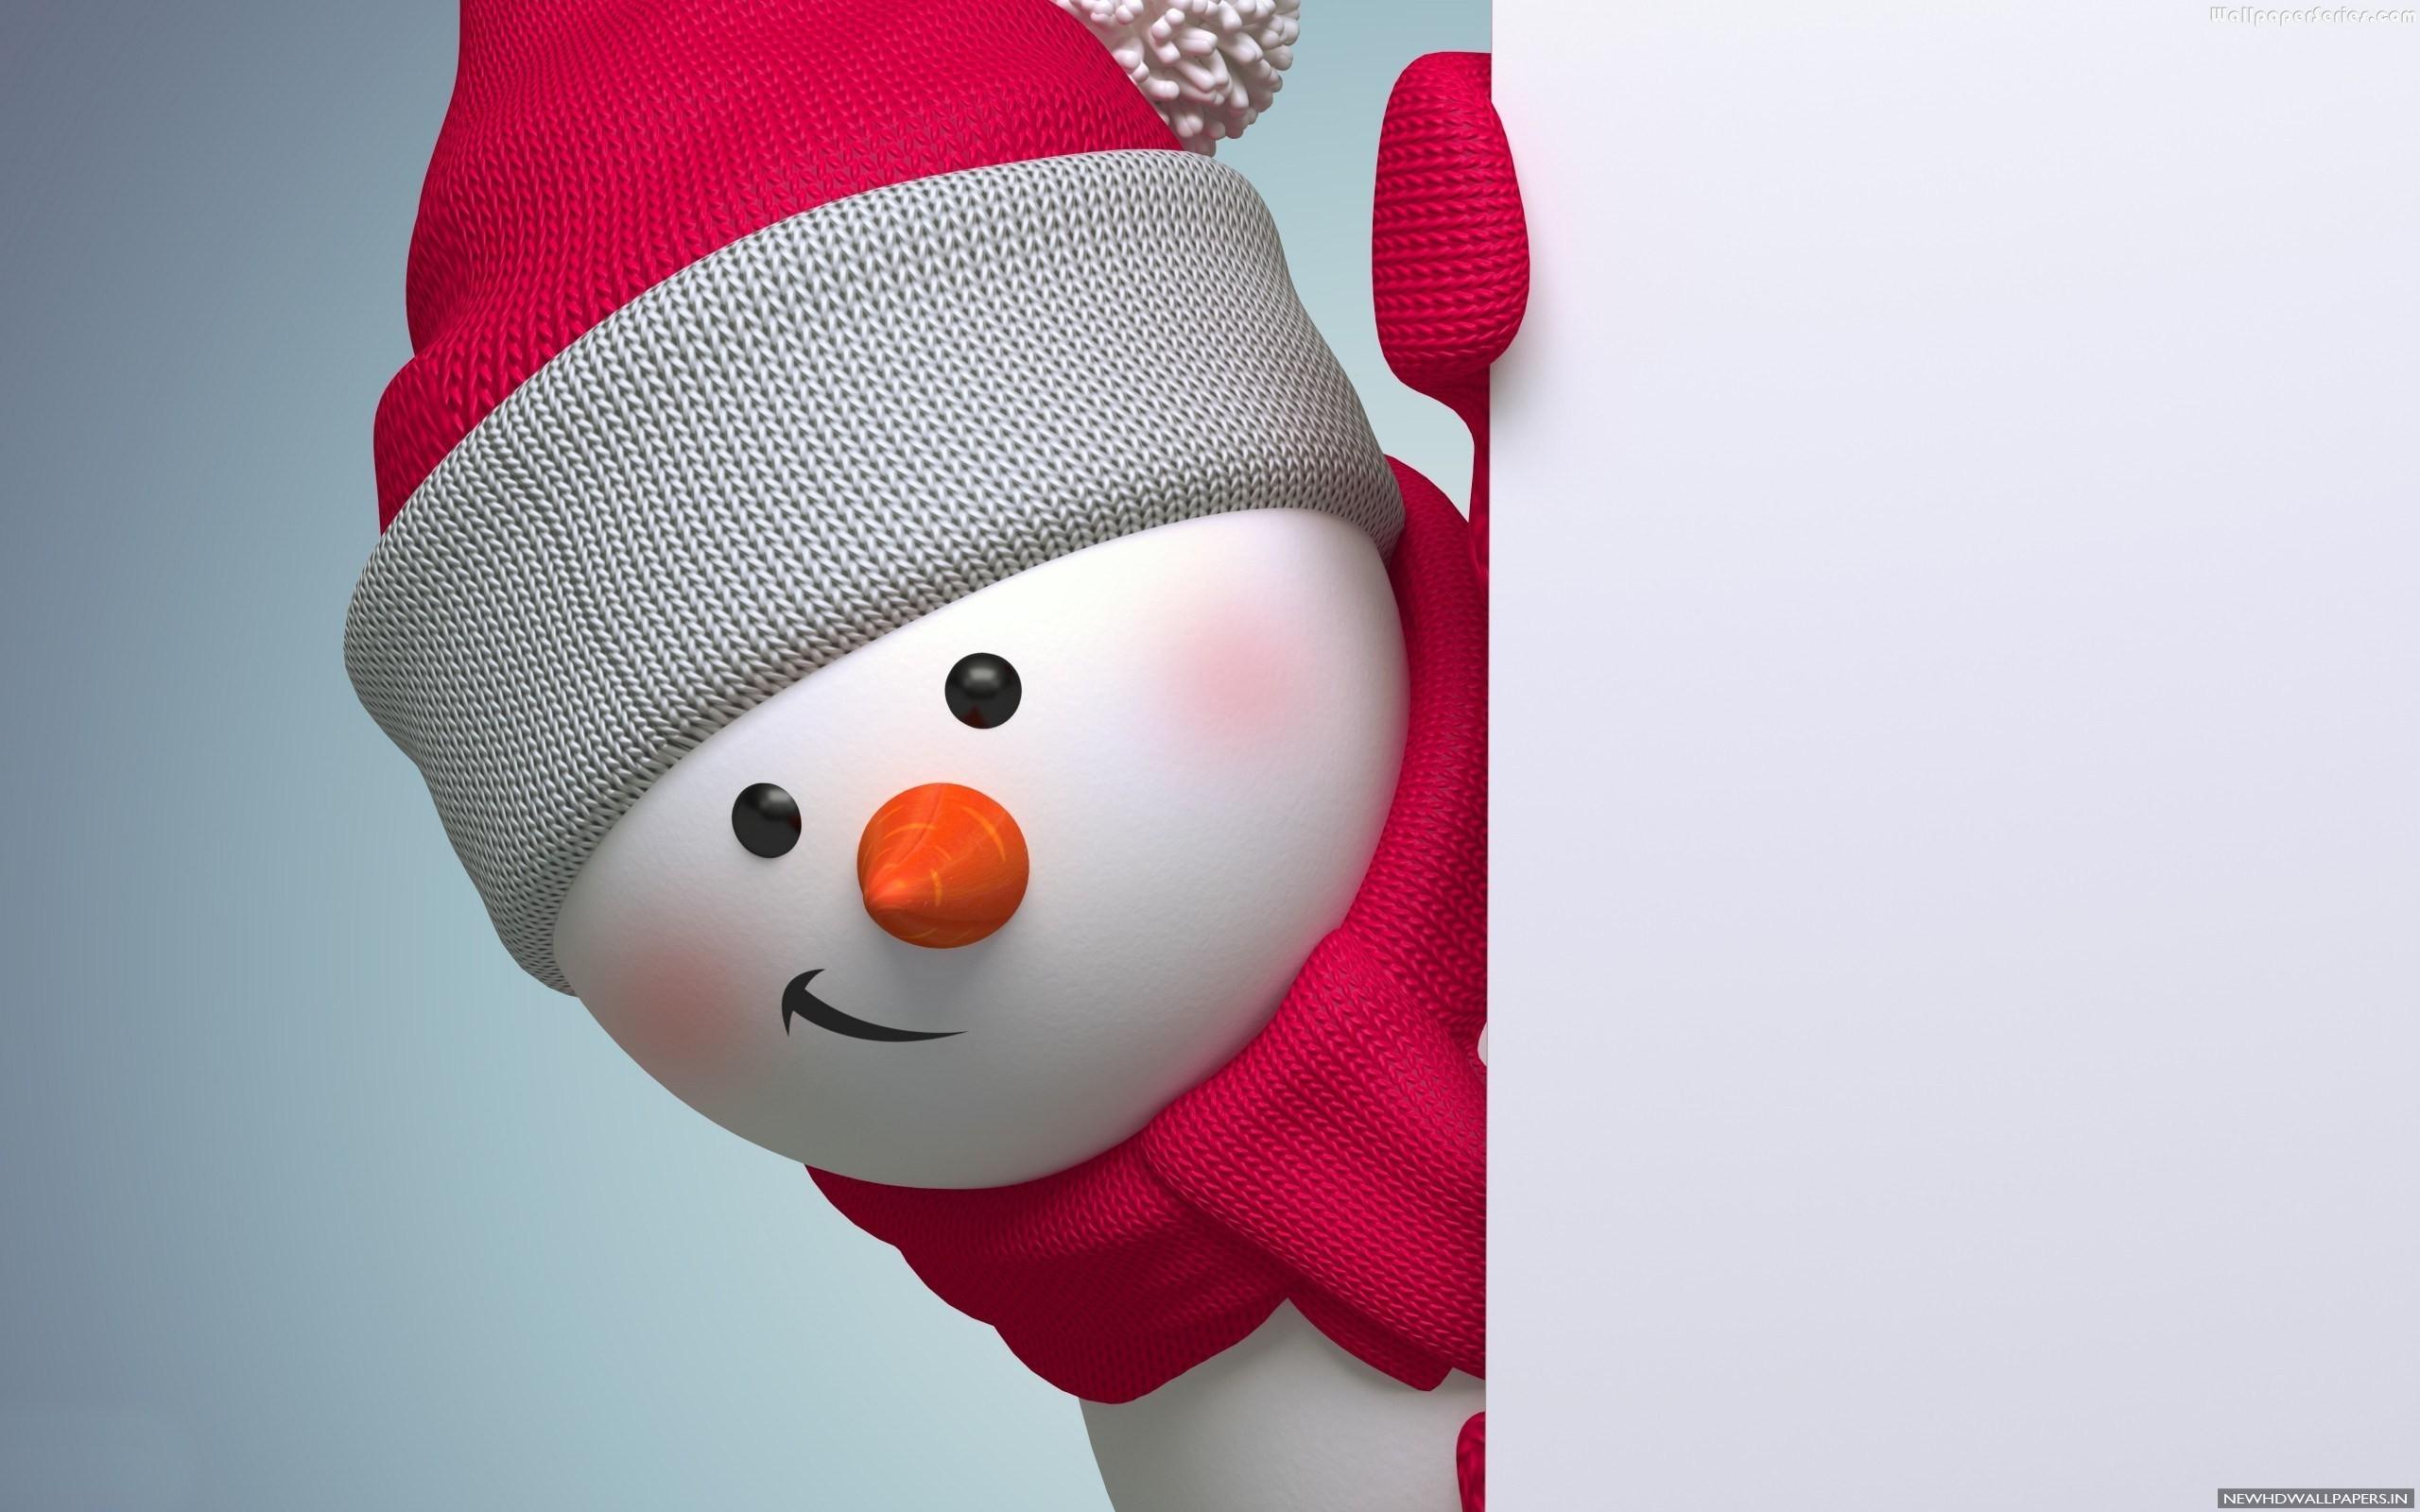 47 Cute Merry Christmas Wallpaper On Wallpapersafari